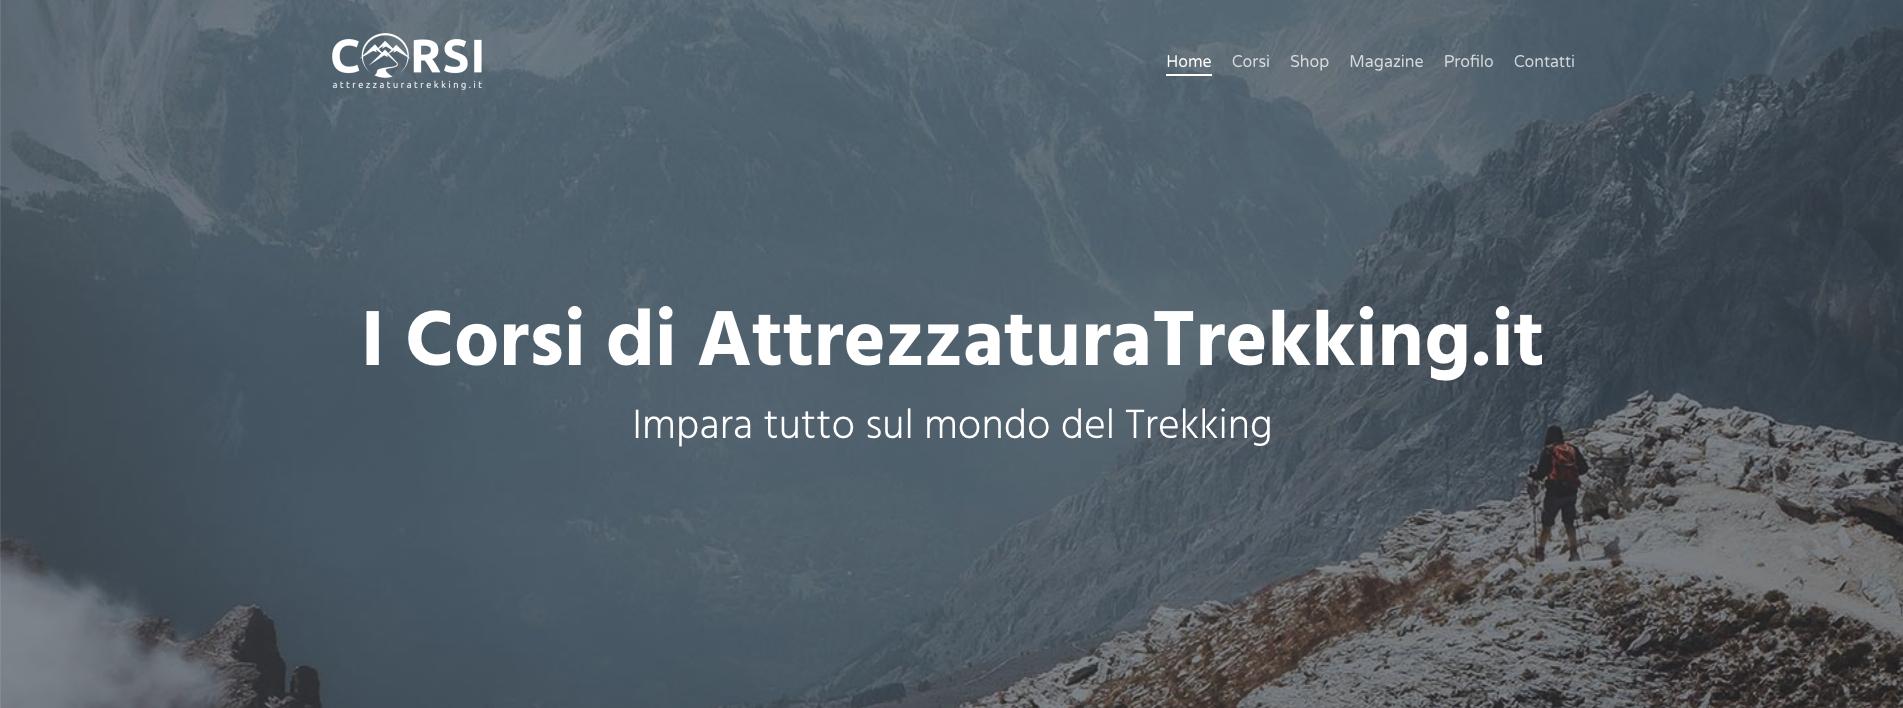 AttrezzaturaTrekking.it - Corsi